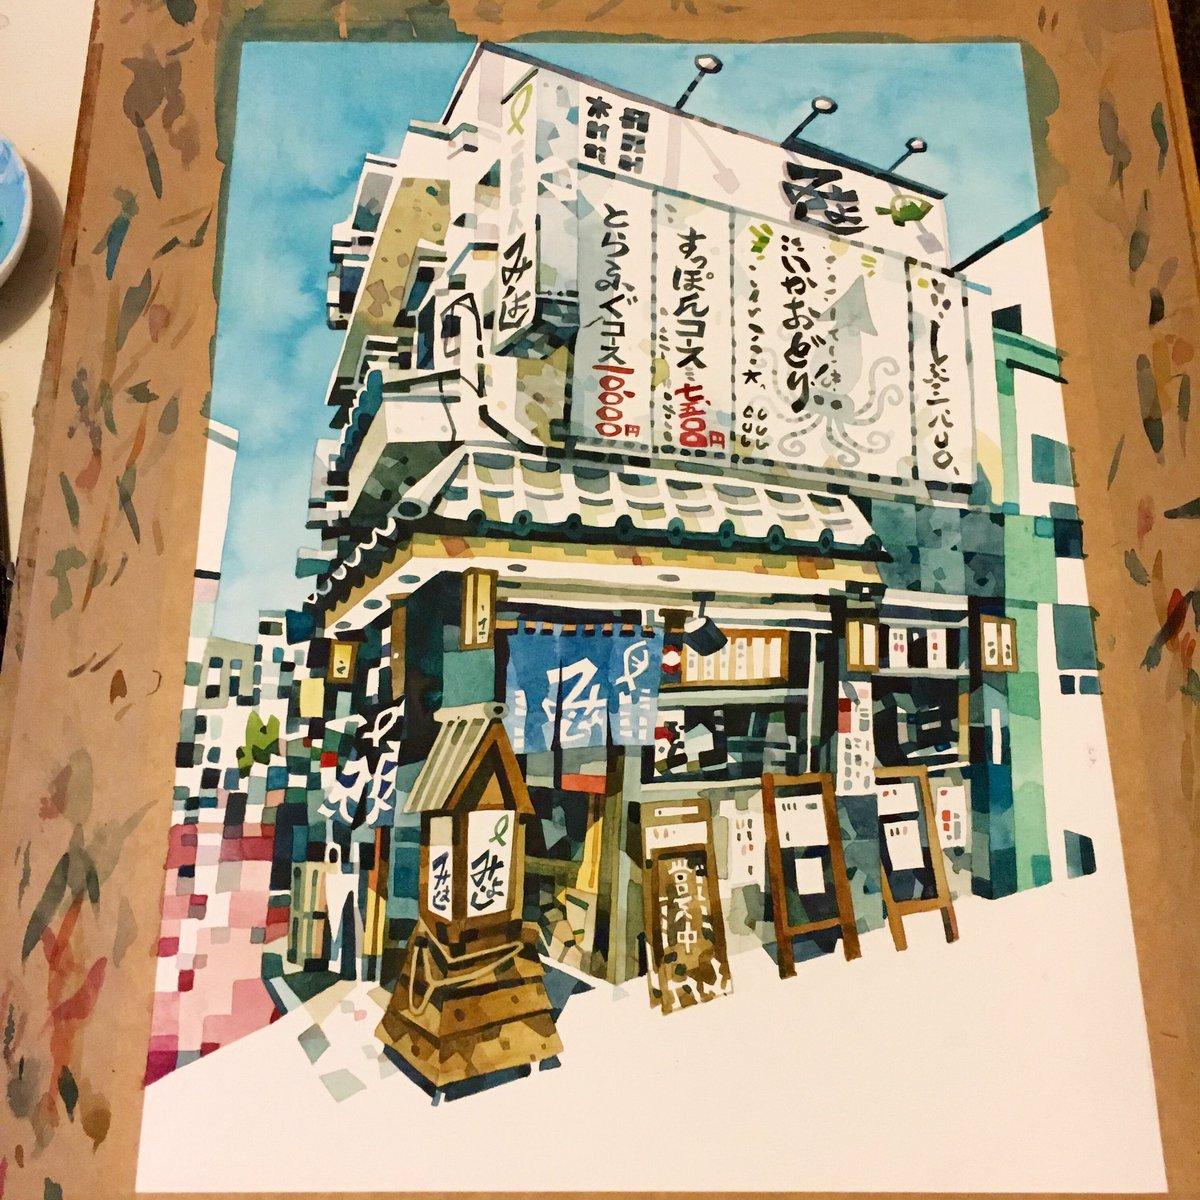 Think I'm done. Street corner restaurant in Asakusa, Tokyo. https://t.co/ETGAcye1y6